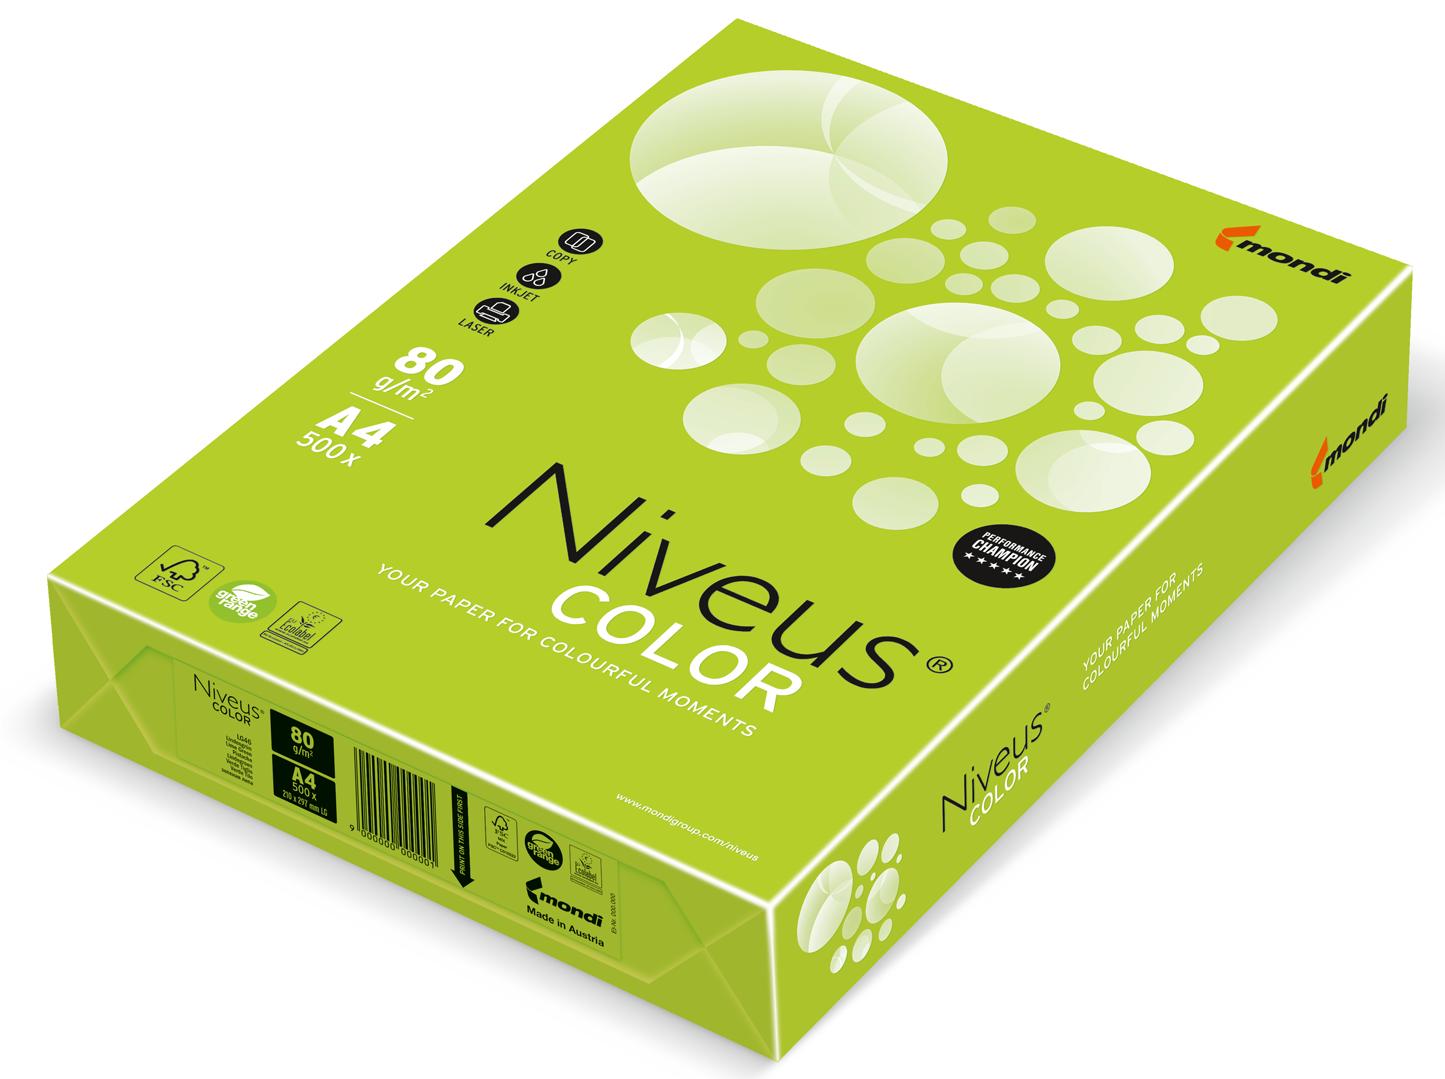 Бумага офисная цветная Niveus LG 46 А4, 80 г/м2, 500 листов, лайм